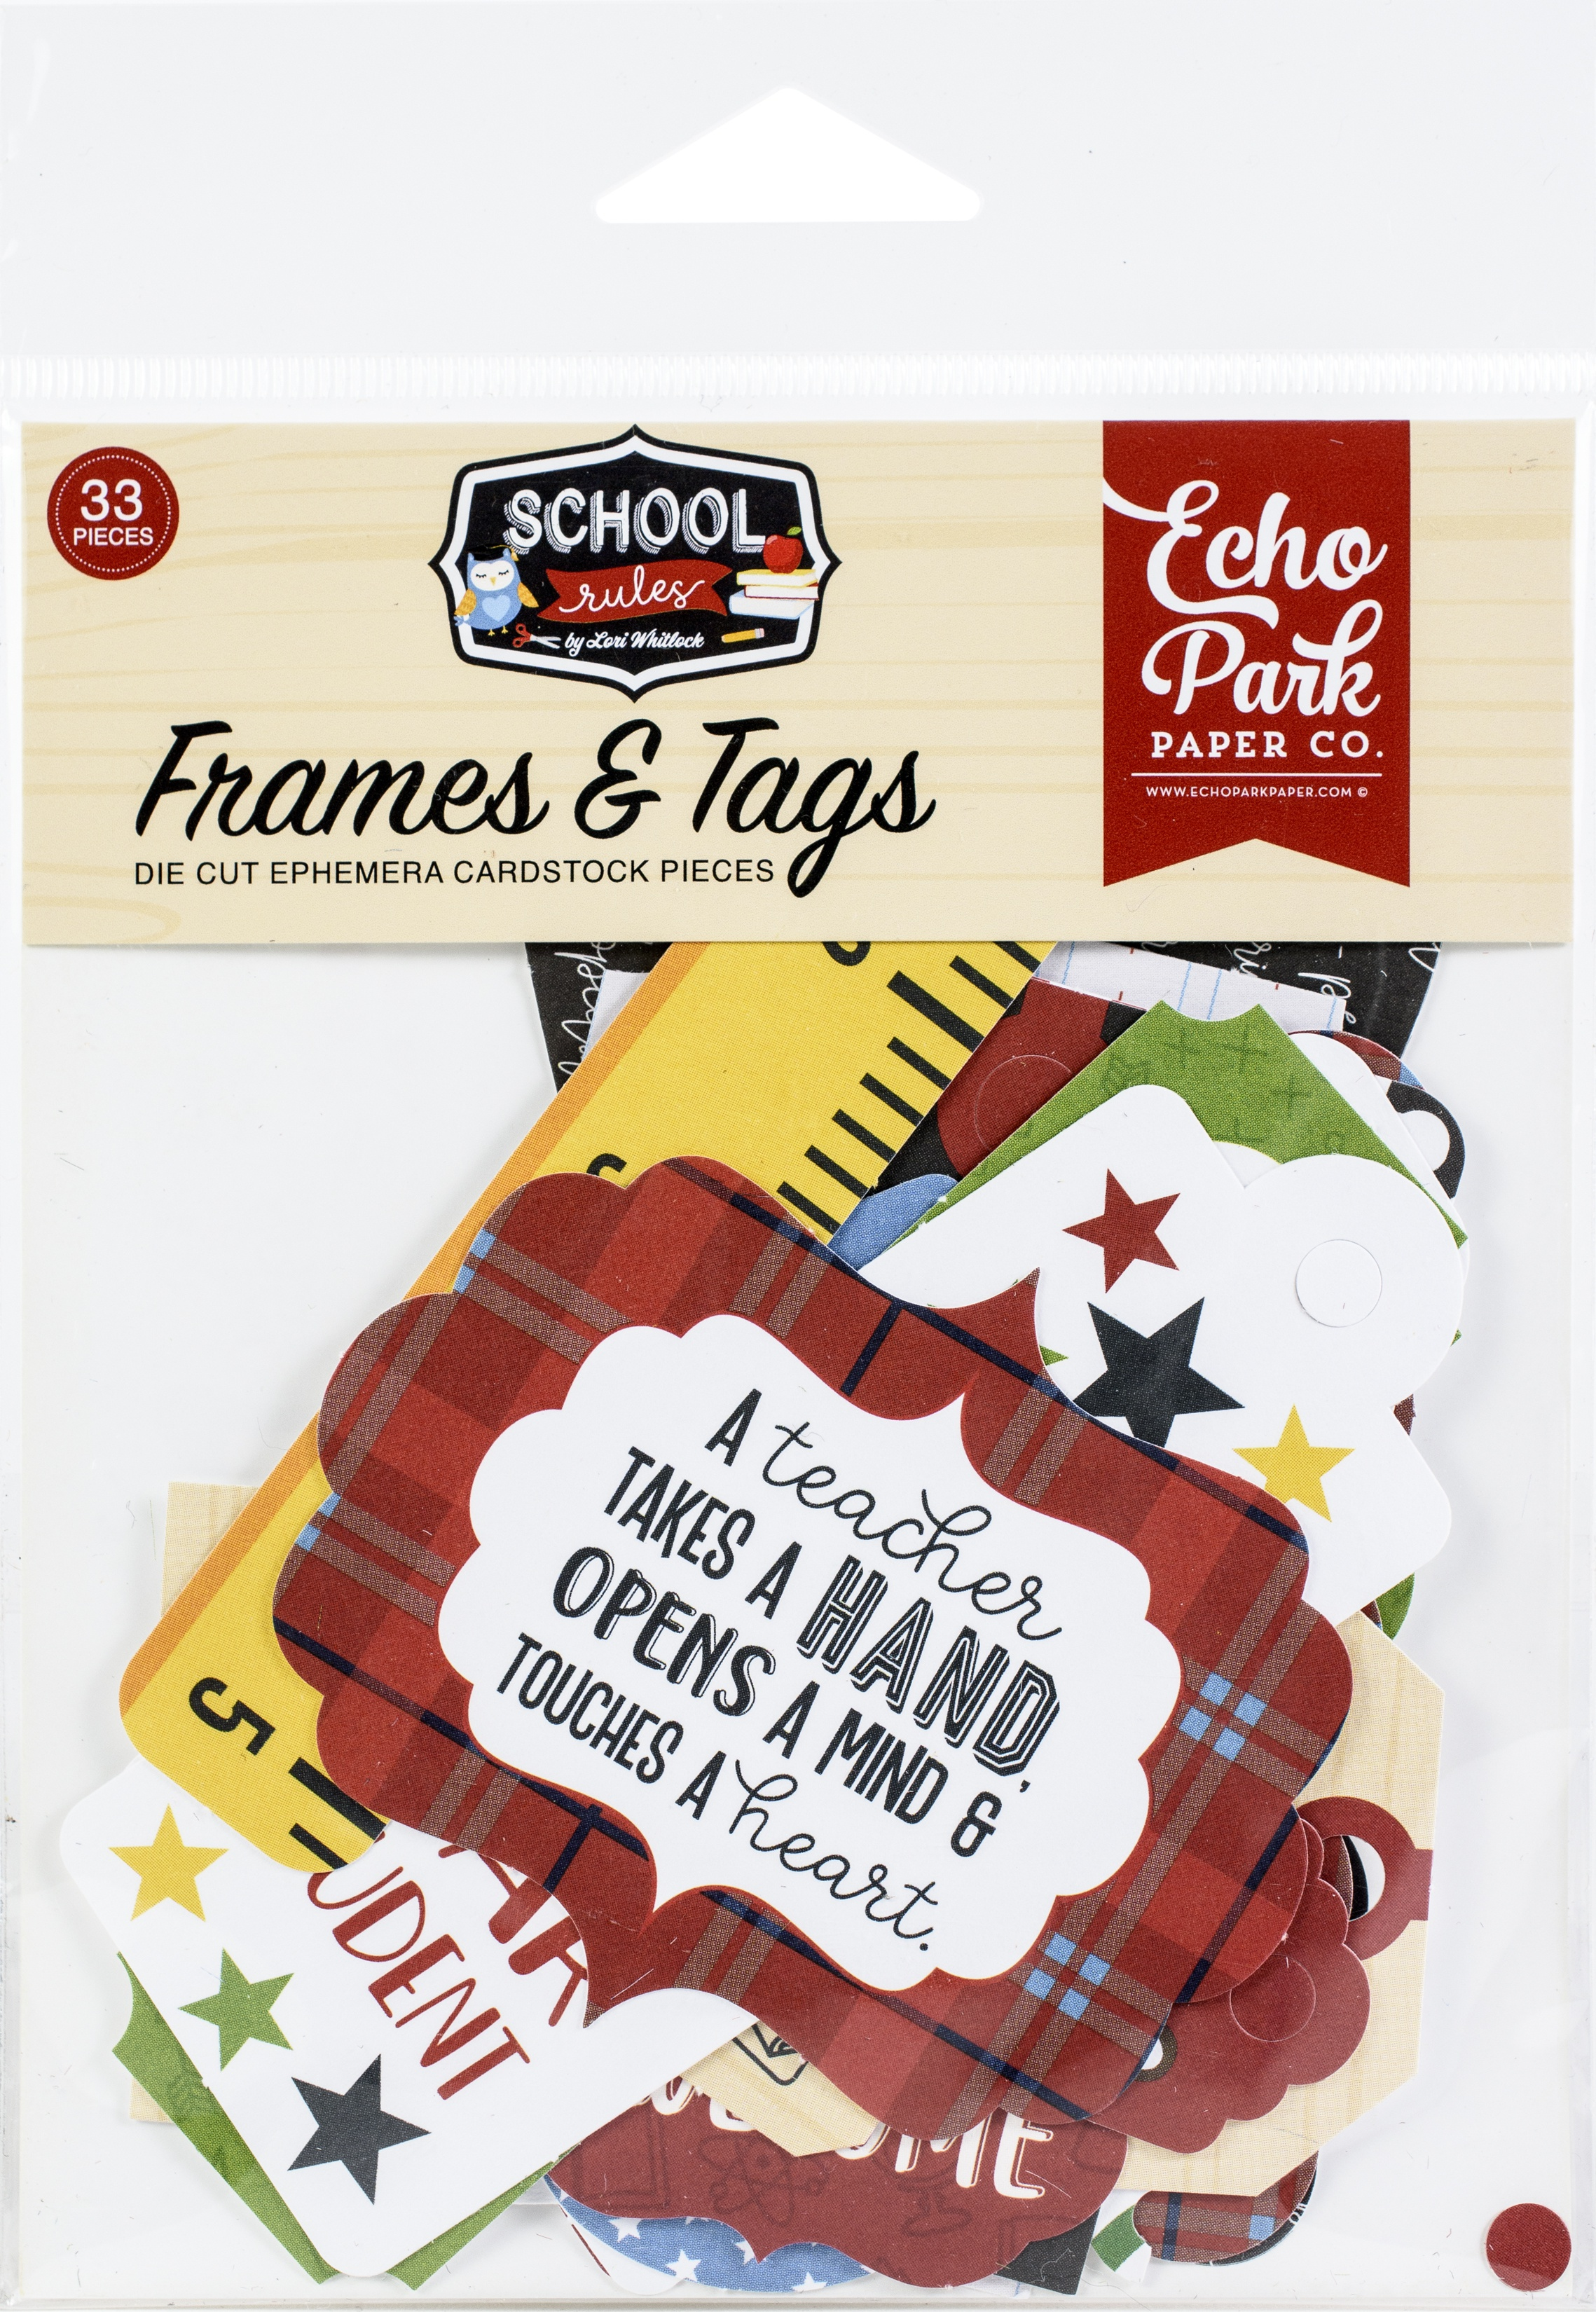 Echo Park School Rules - Frames & Tags Die-Cut Cardstock Pieces